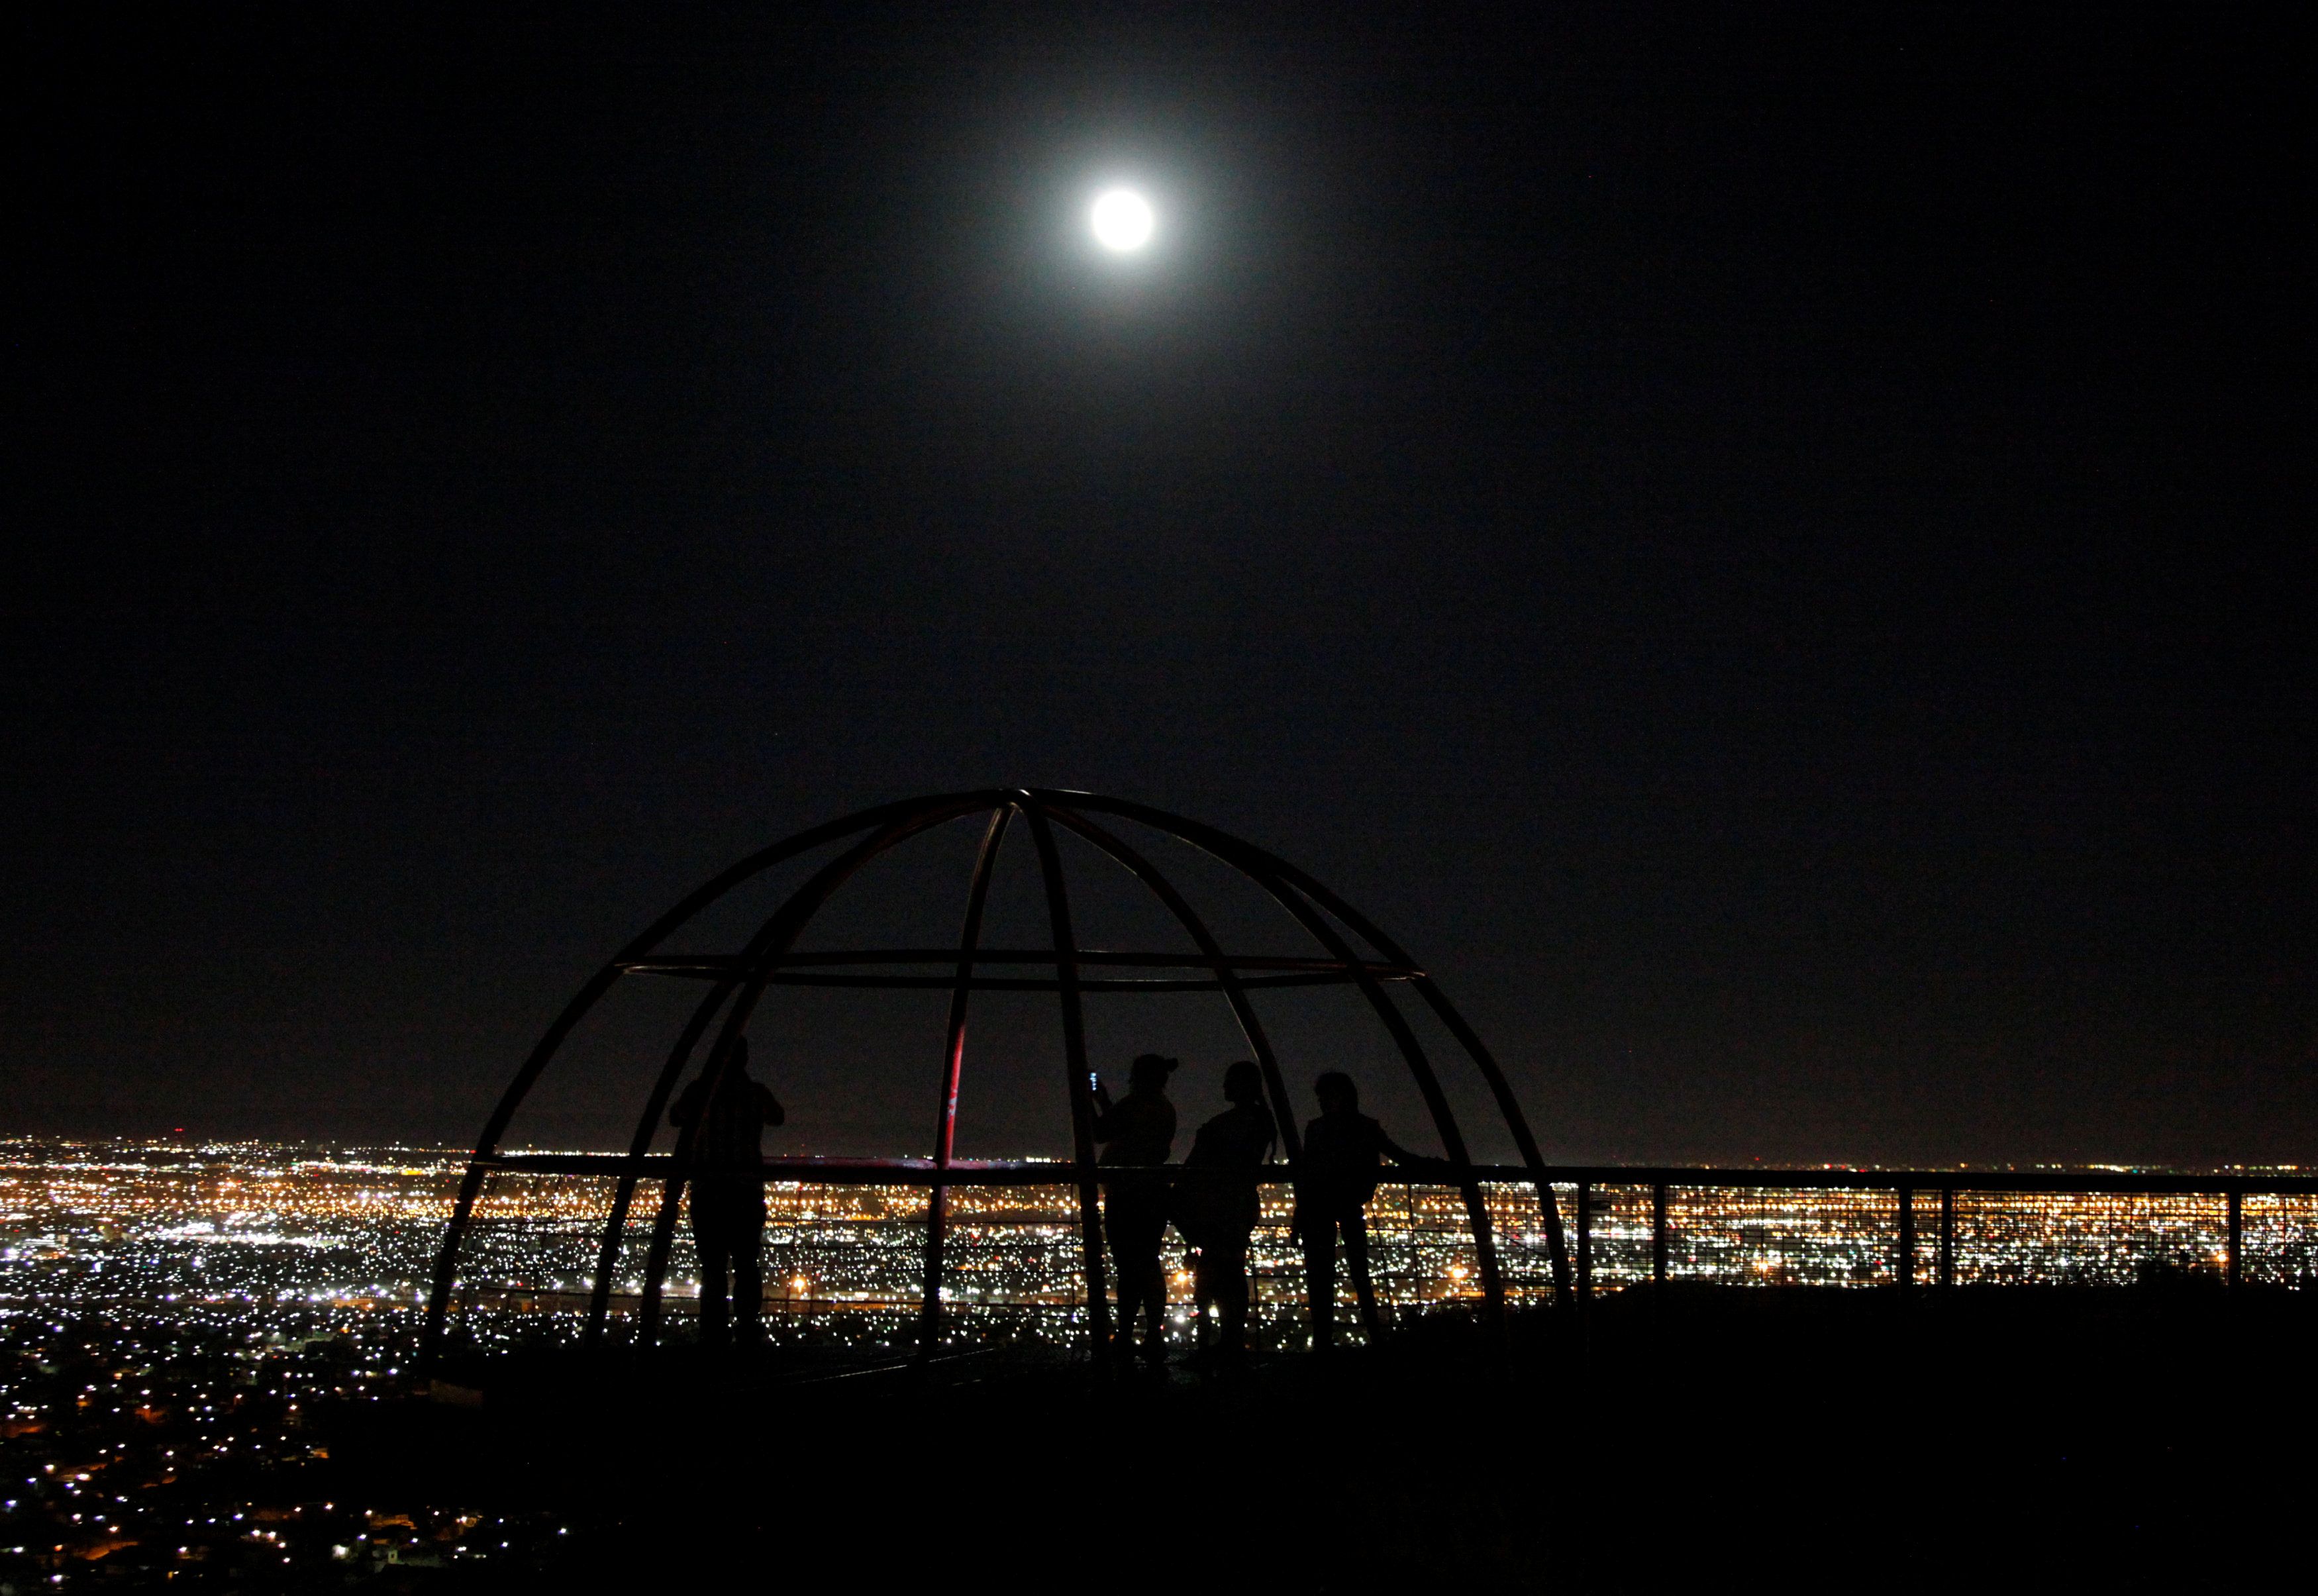 People watch as a supermoon rises over Ciudad Juarez, Mexico, October 16, 2016.  REUTERS/Jose Luis Gonzalez